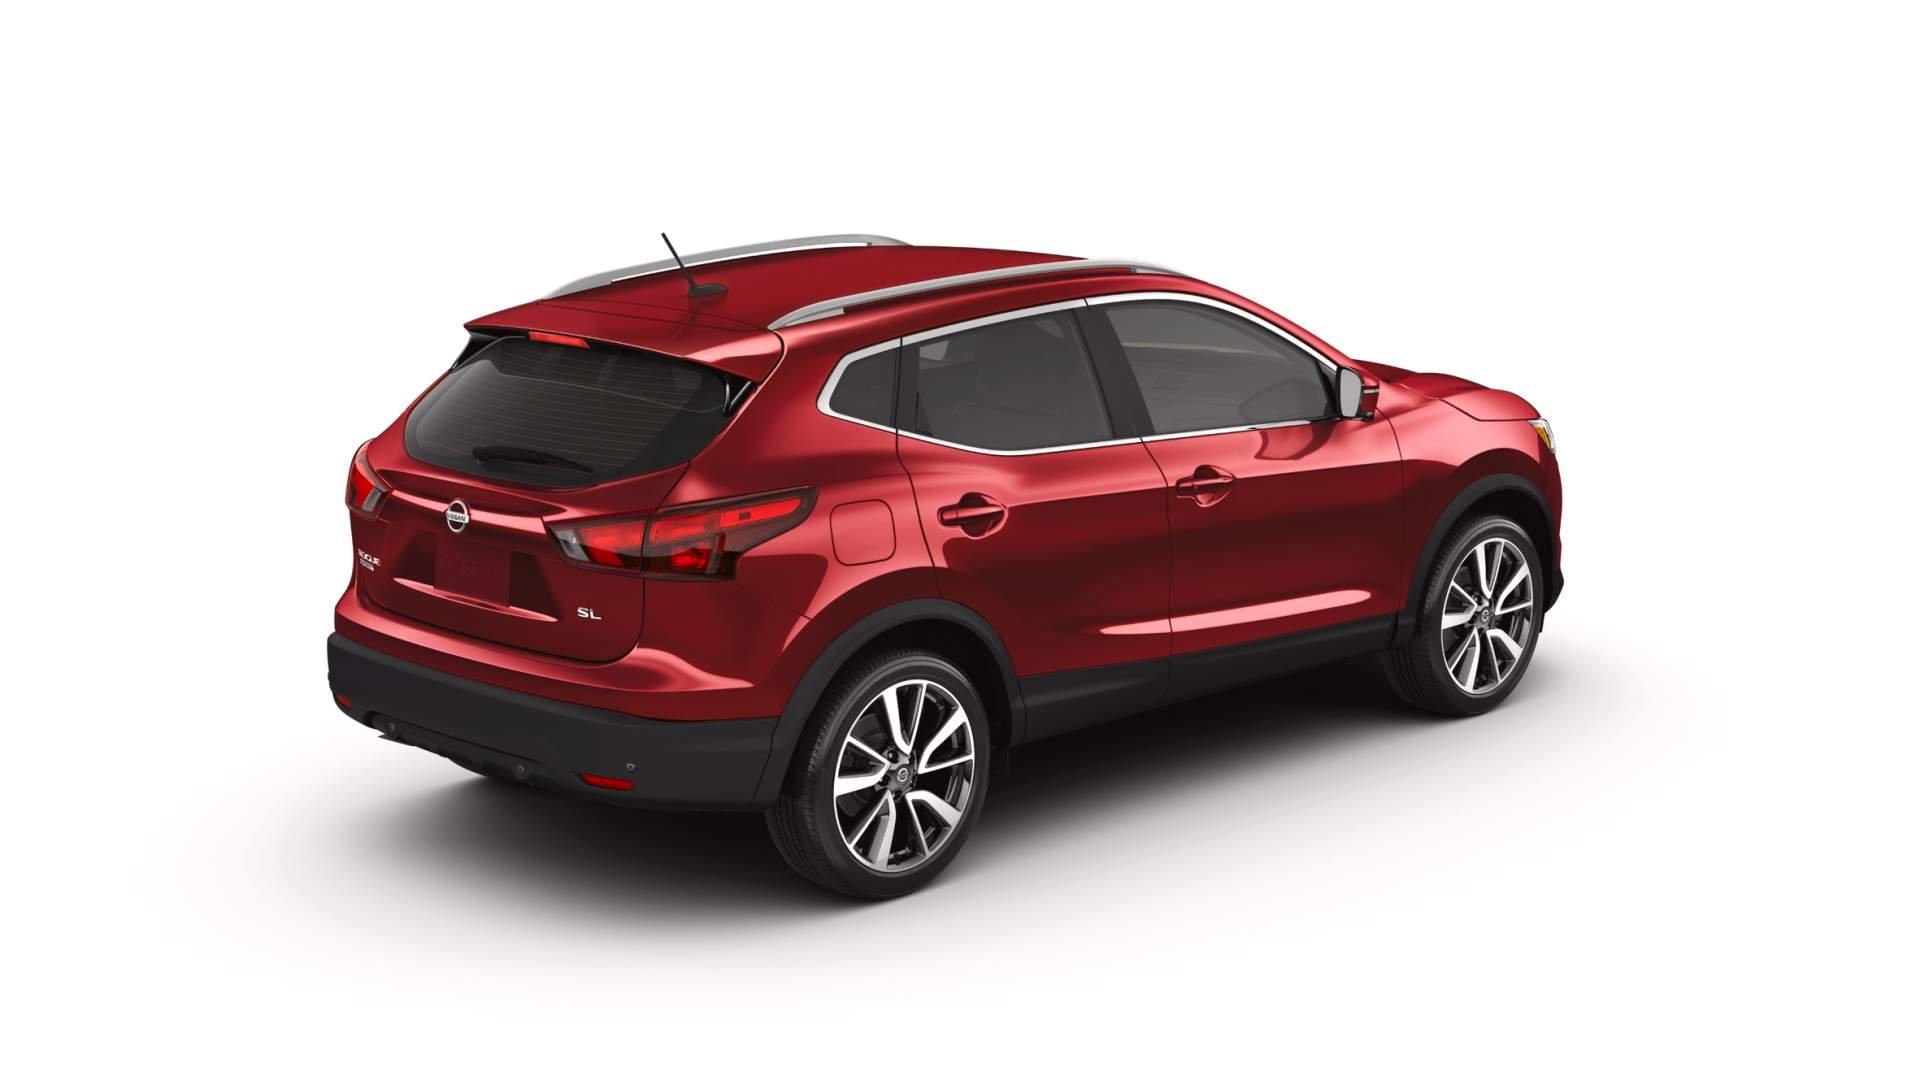 Nissan Umumkan Harga Terbaru Nissan Rogue Sport Blackxperiencecom